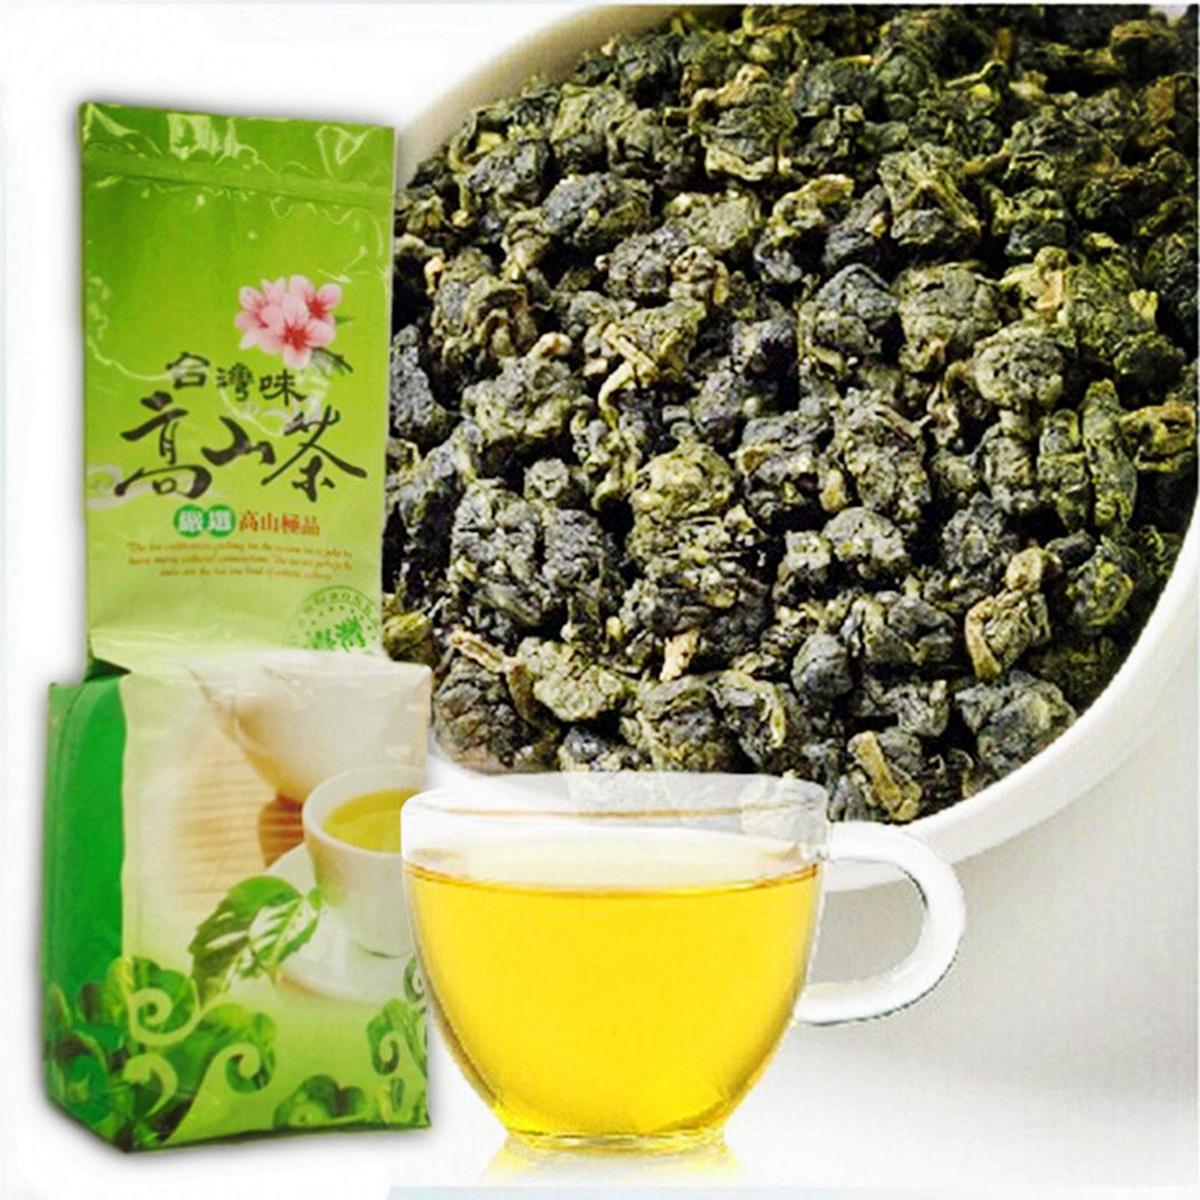 Promotion 250g Milk Oolong Tea High Quality Tiguanyin Green Tea Taiwan jin xuan Milk Oolong Health Care Milk Tea